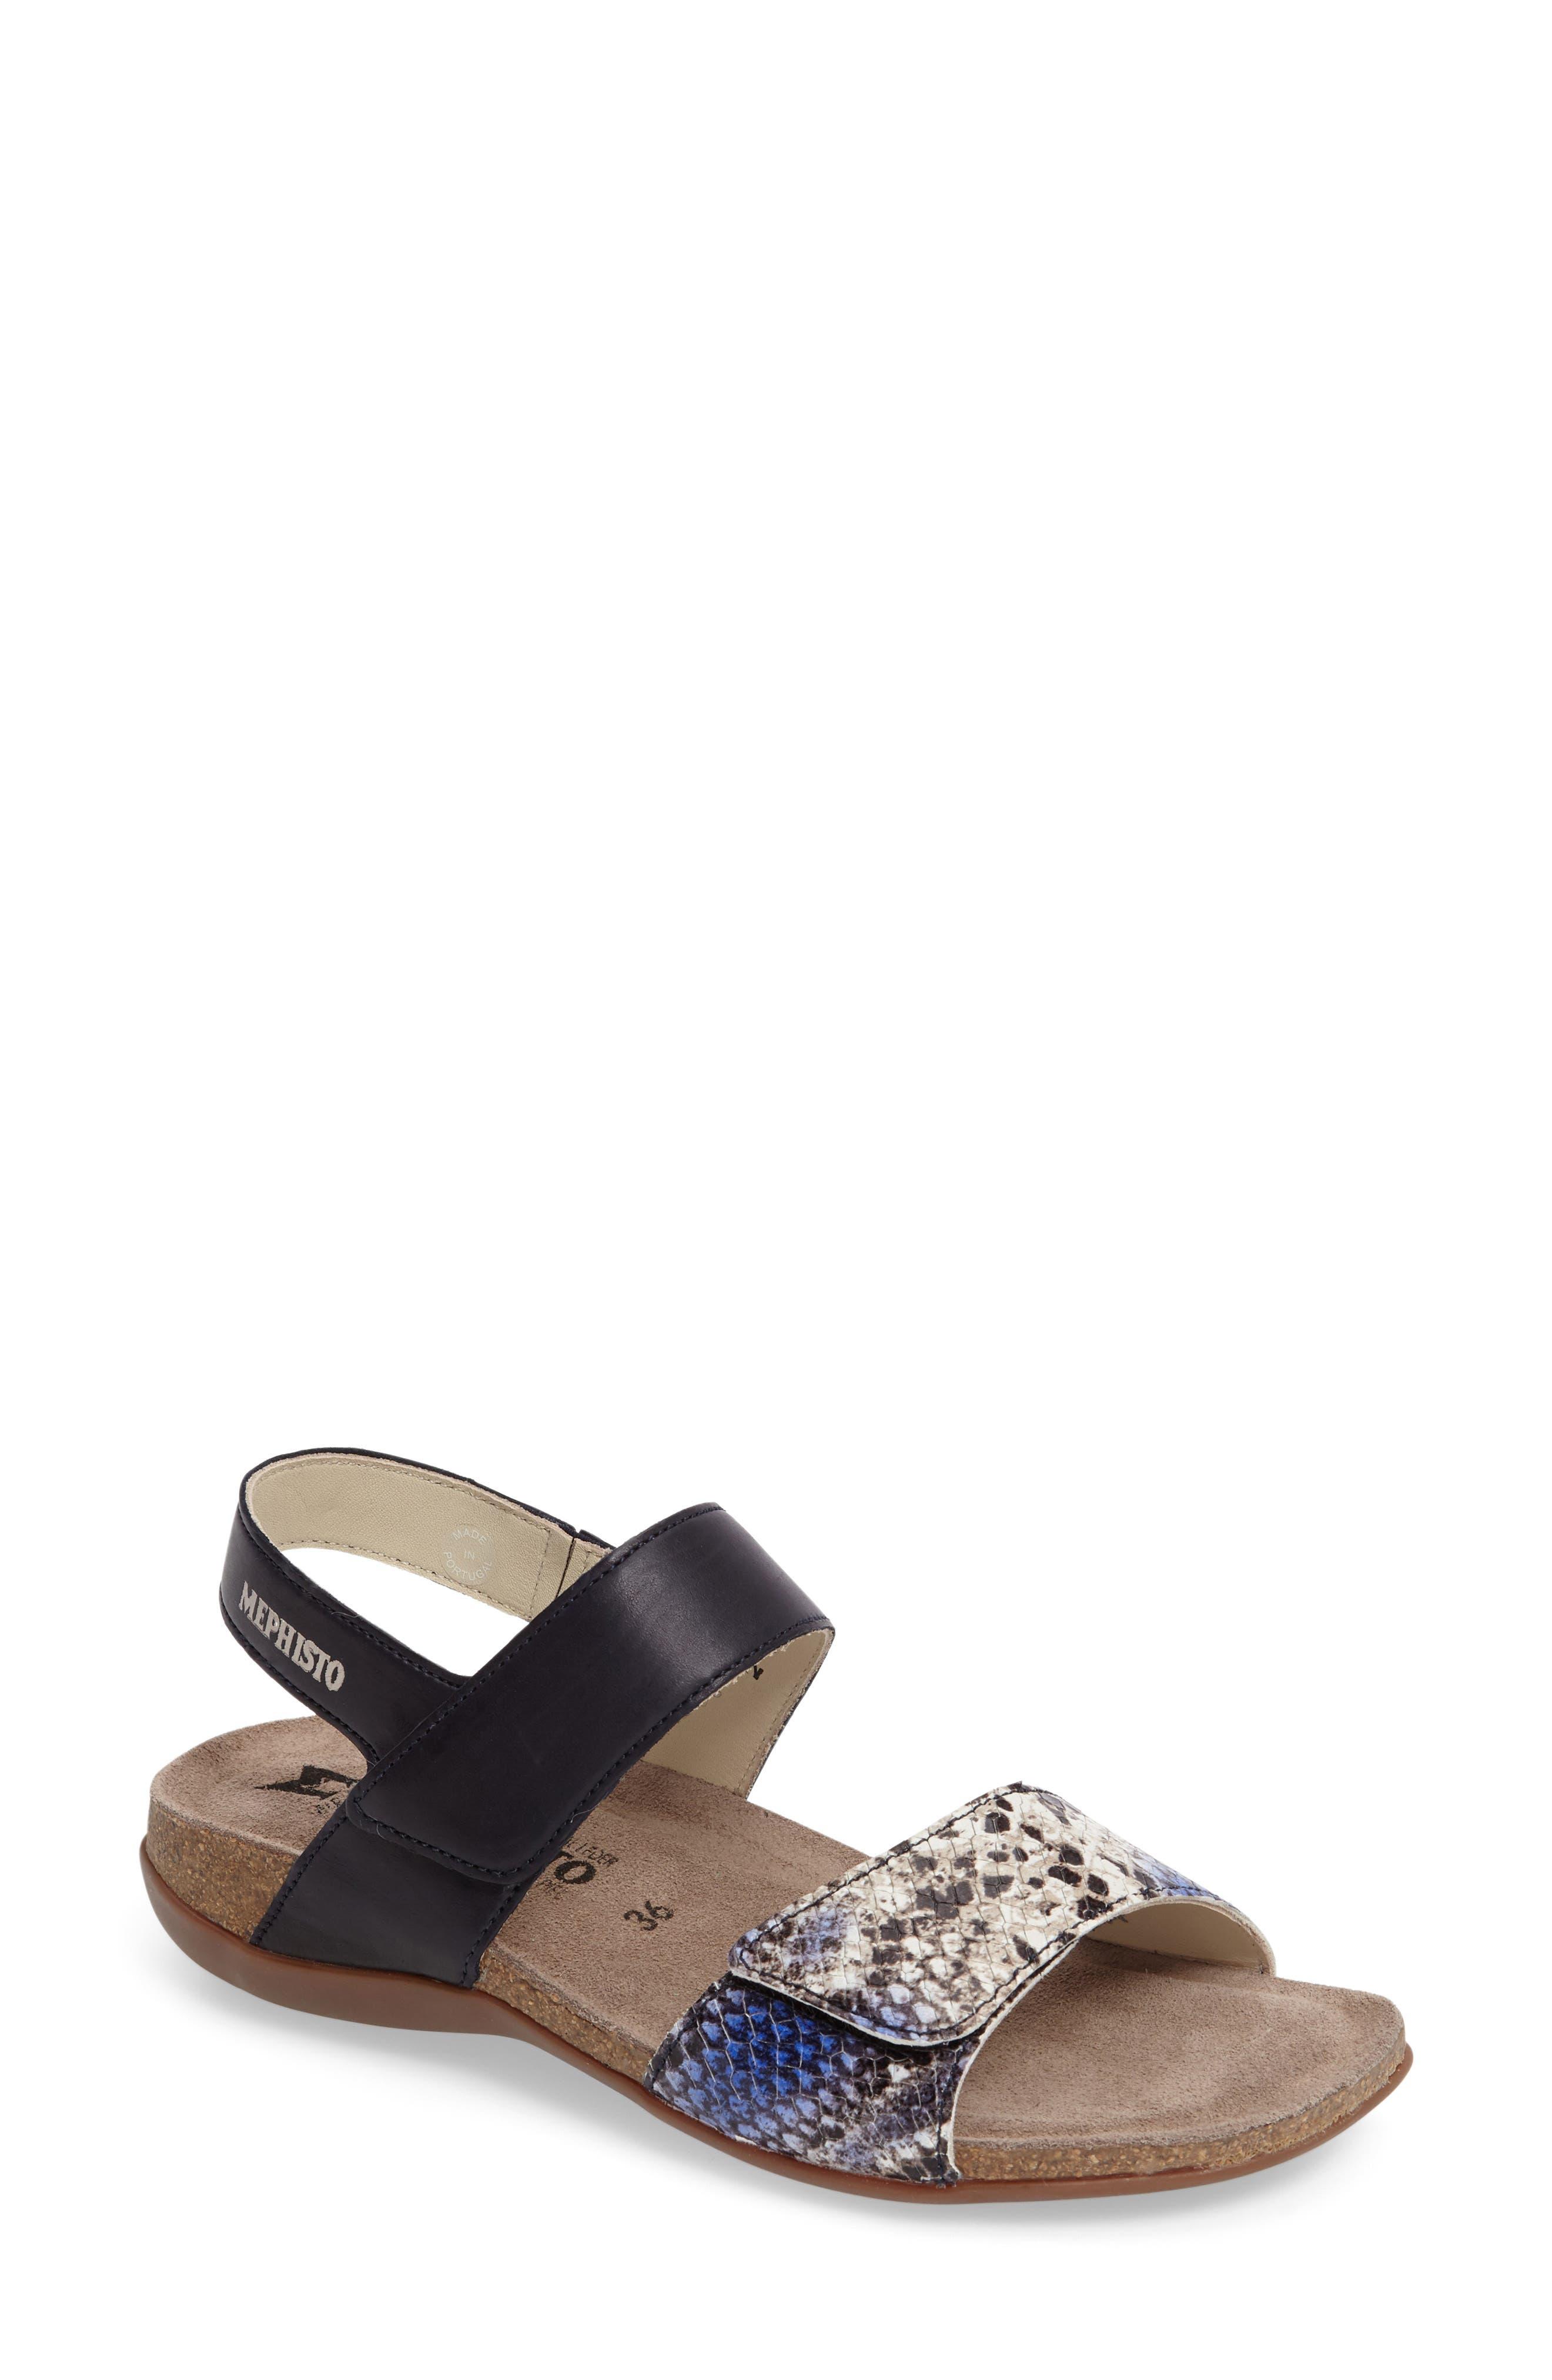 Alternate Image 1 Selected - Mephisto 'Agave' Sandal